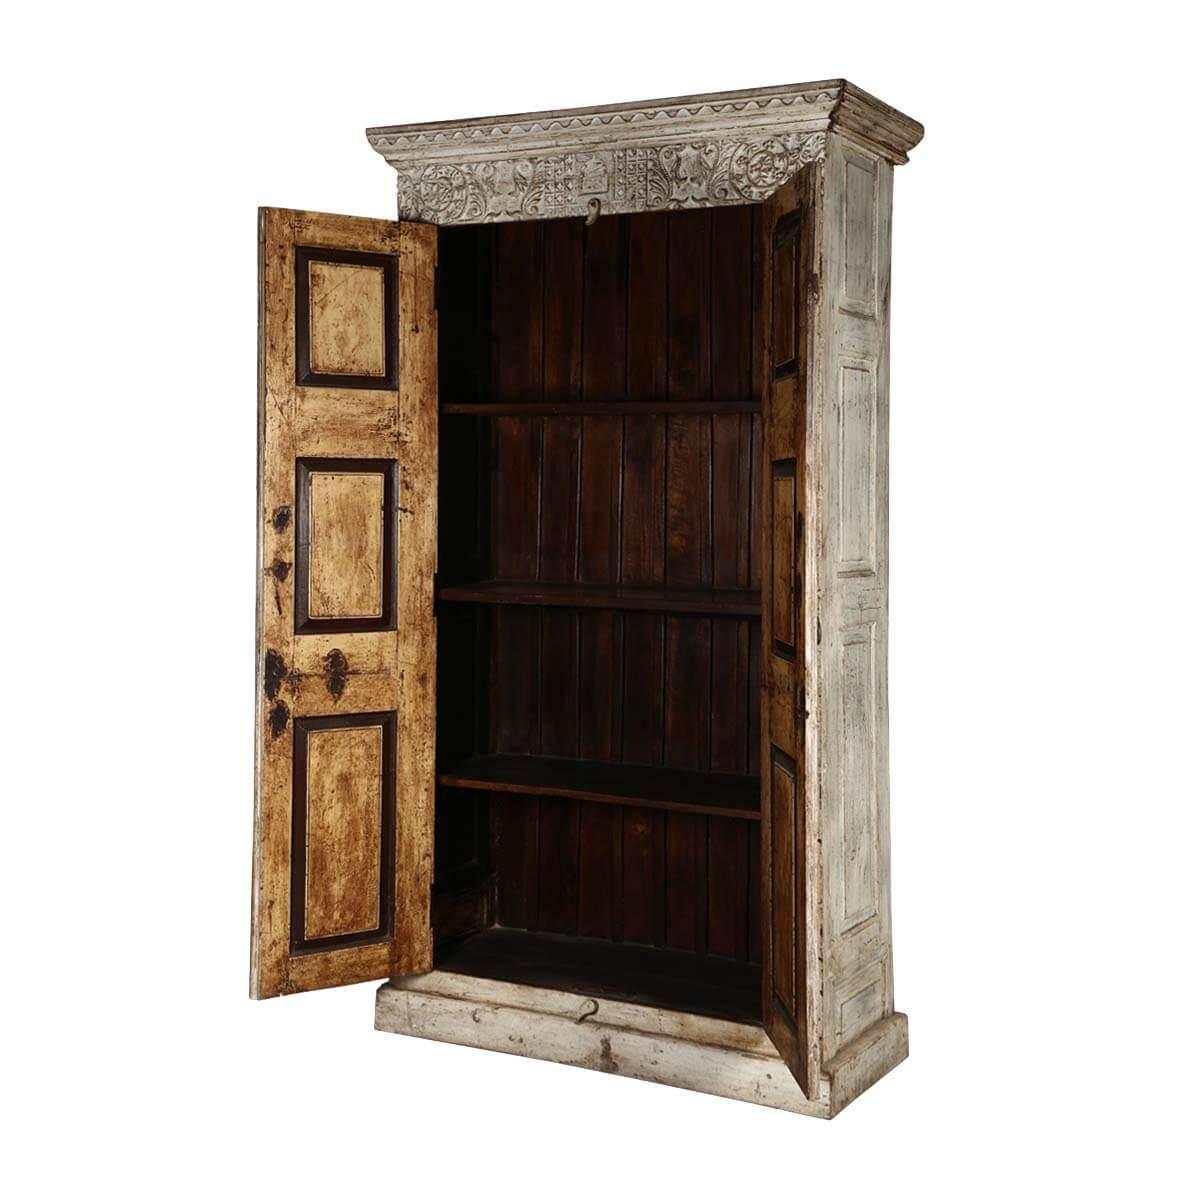 dakota handcrafted solid wood 2 door rustic tall storage cabinet. Black Bedroom Furniture Sets. Home Design Ideas